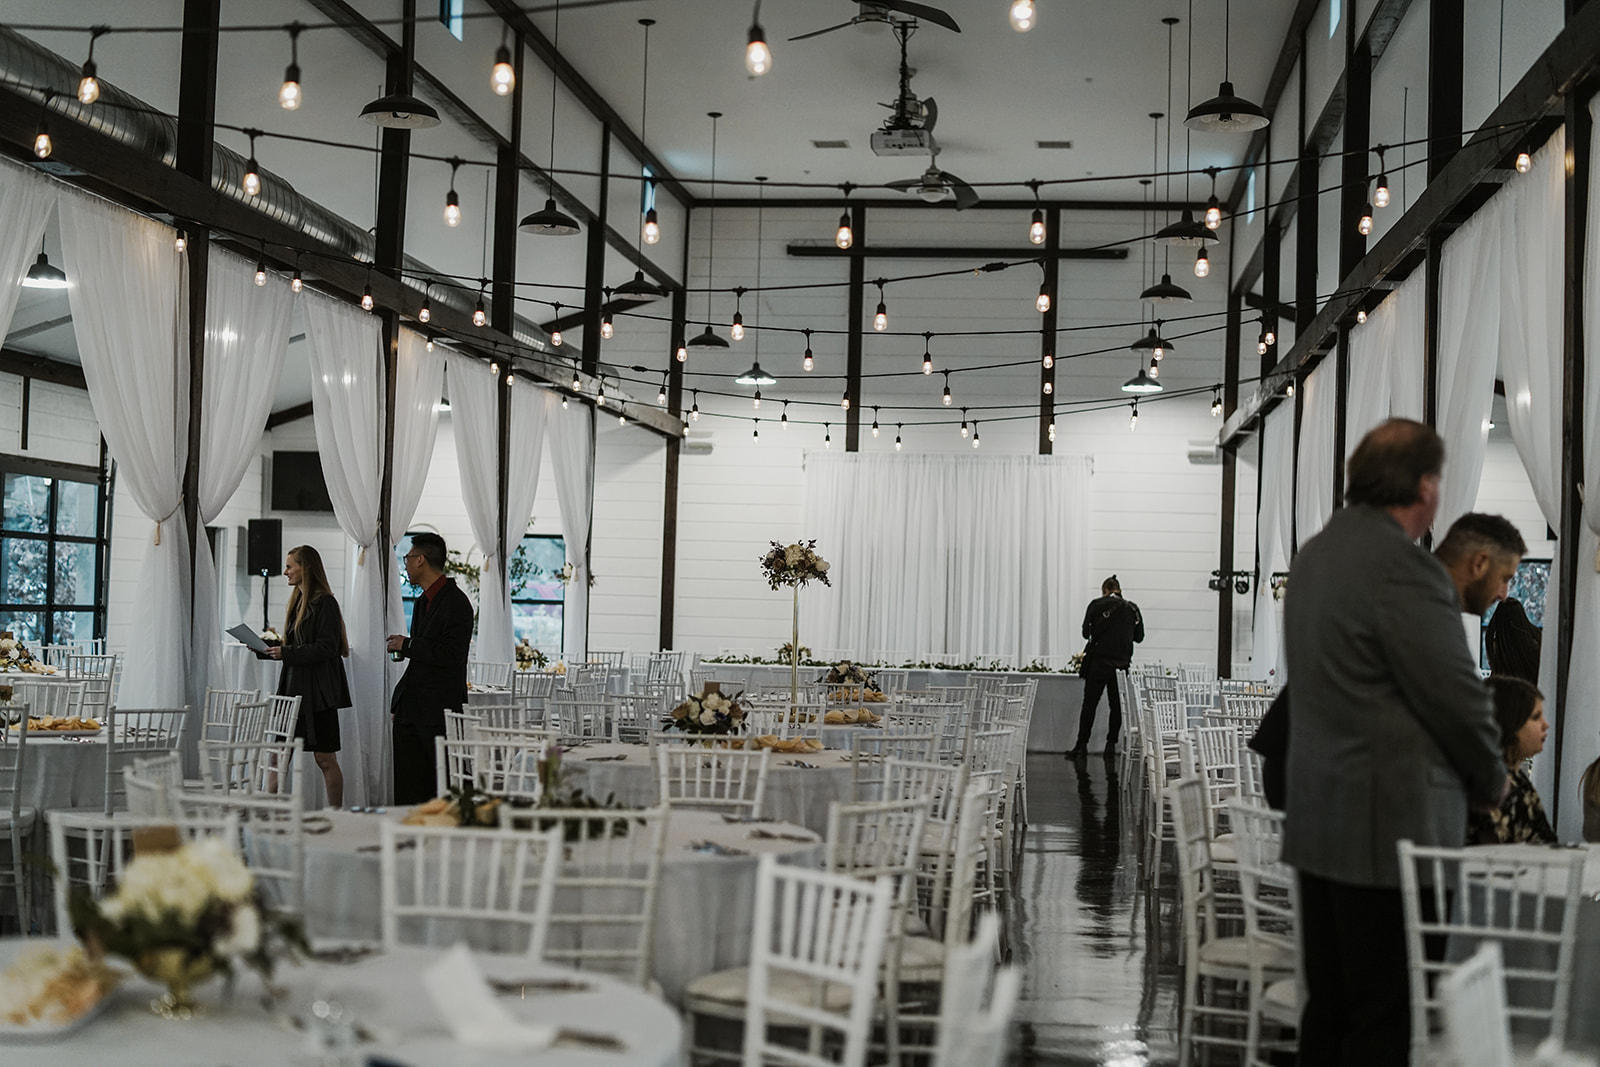 Bixby Tulsa White Barn Wedding Venues 5.jpg